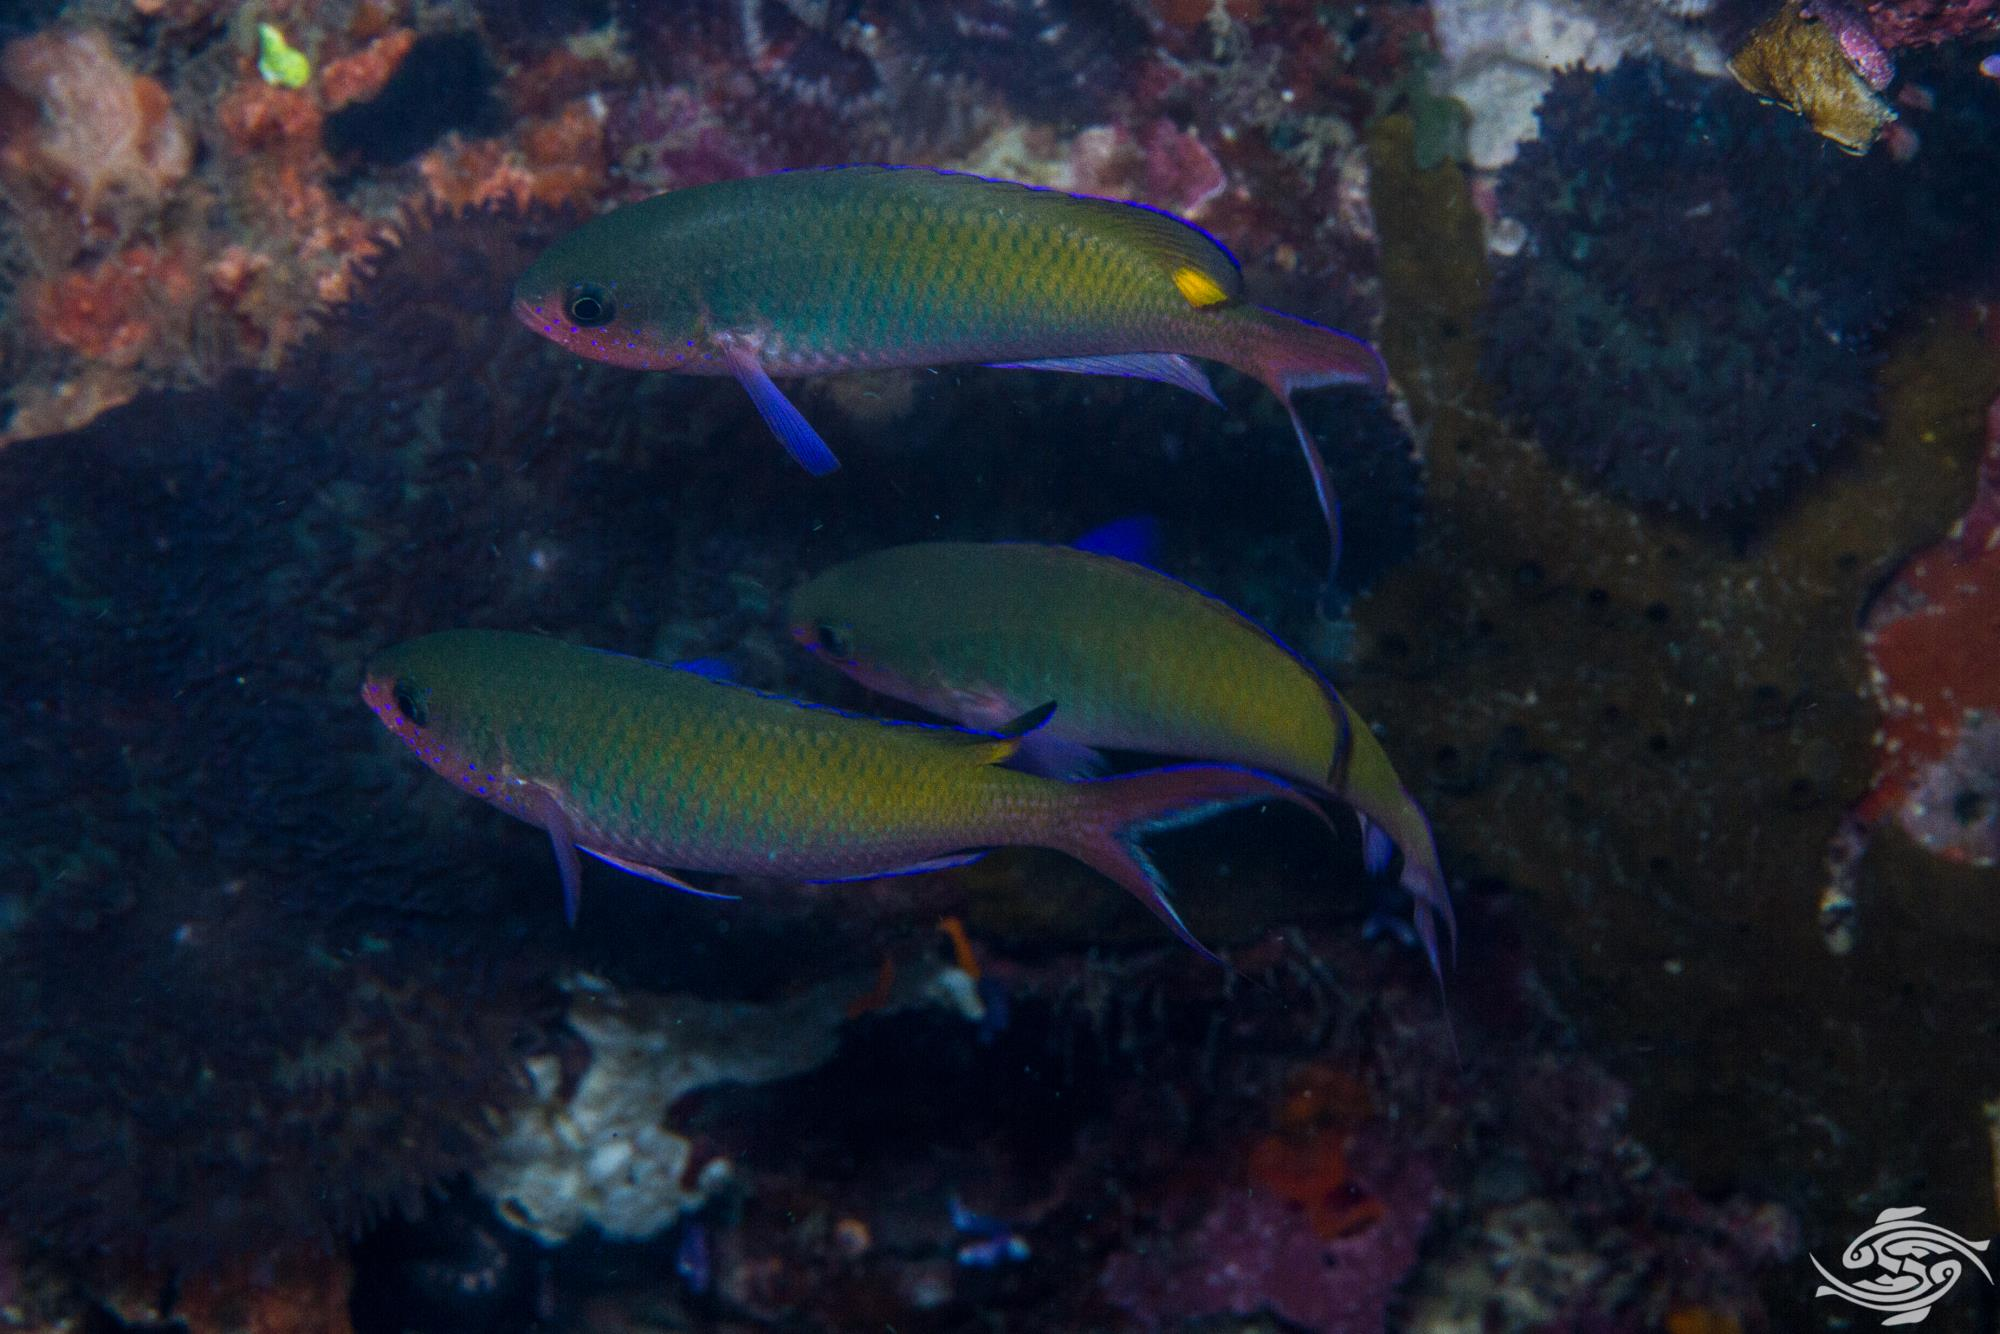 Fusilier Damselfish Lepidozygus tapeinosoma